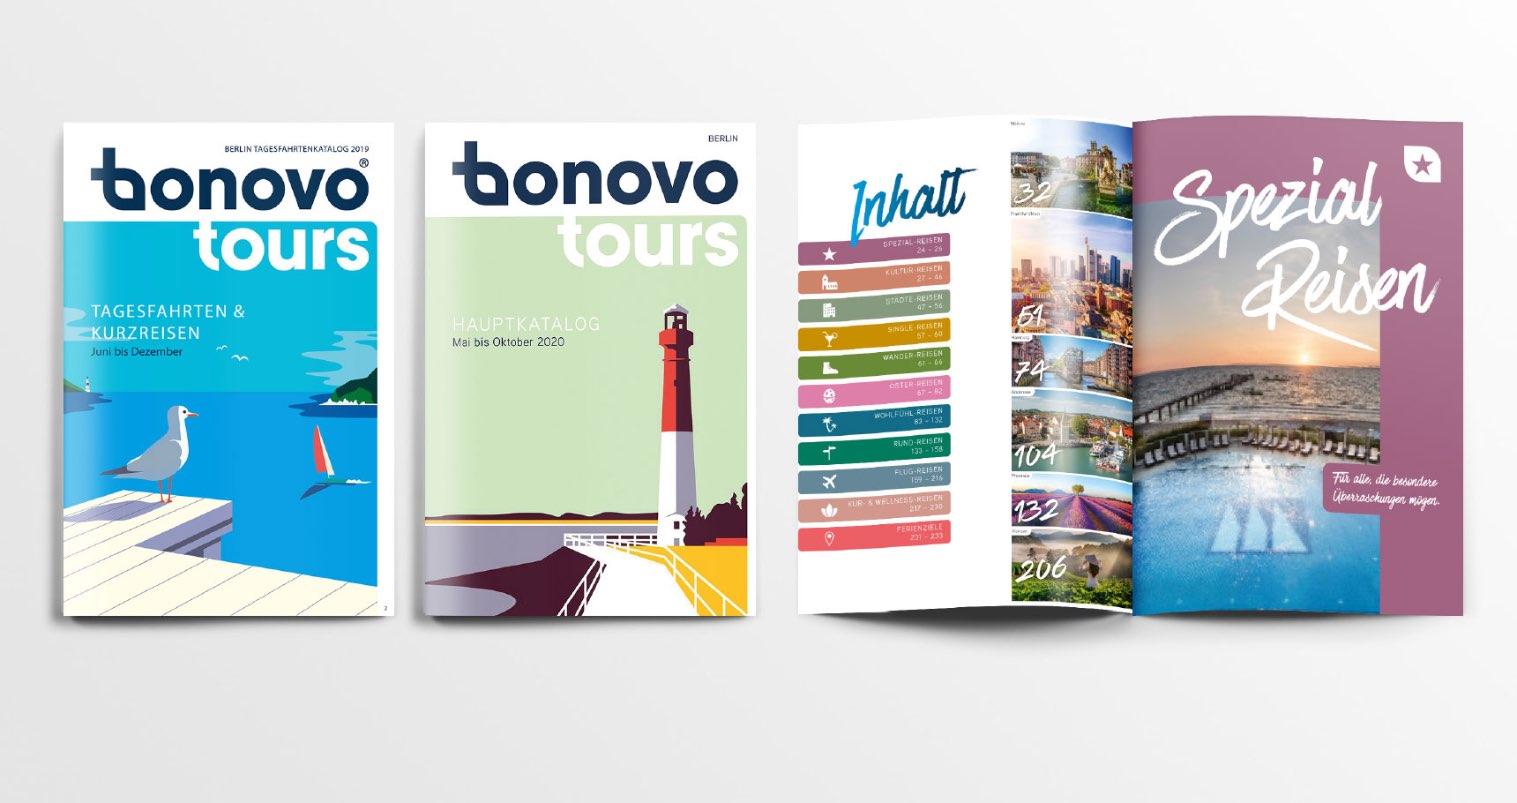 Bonovo Illu Katalog